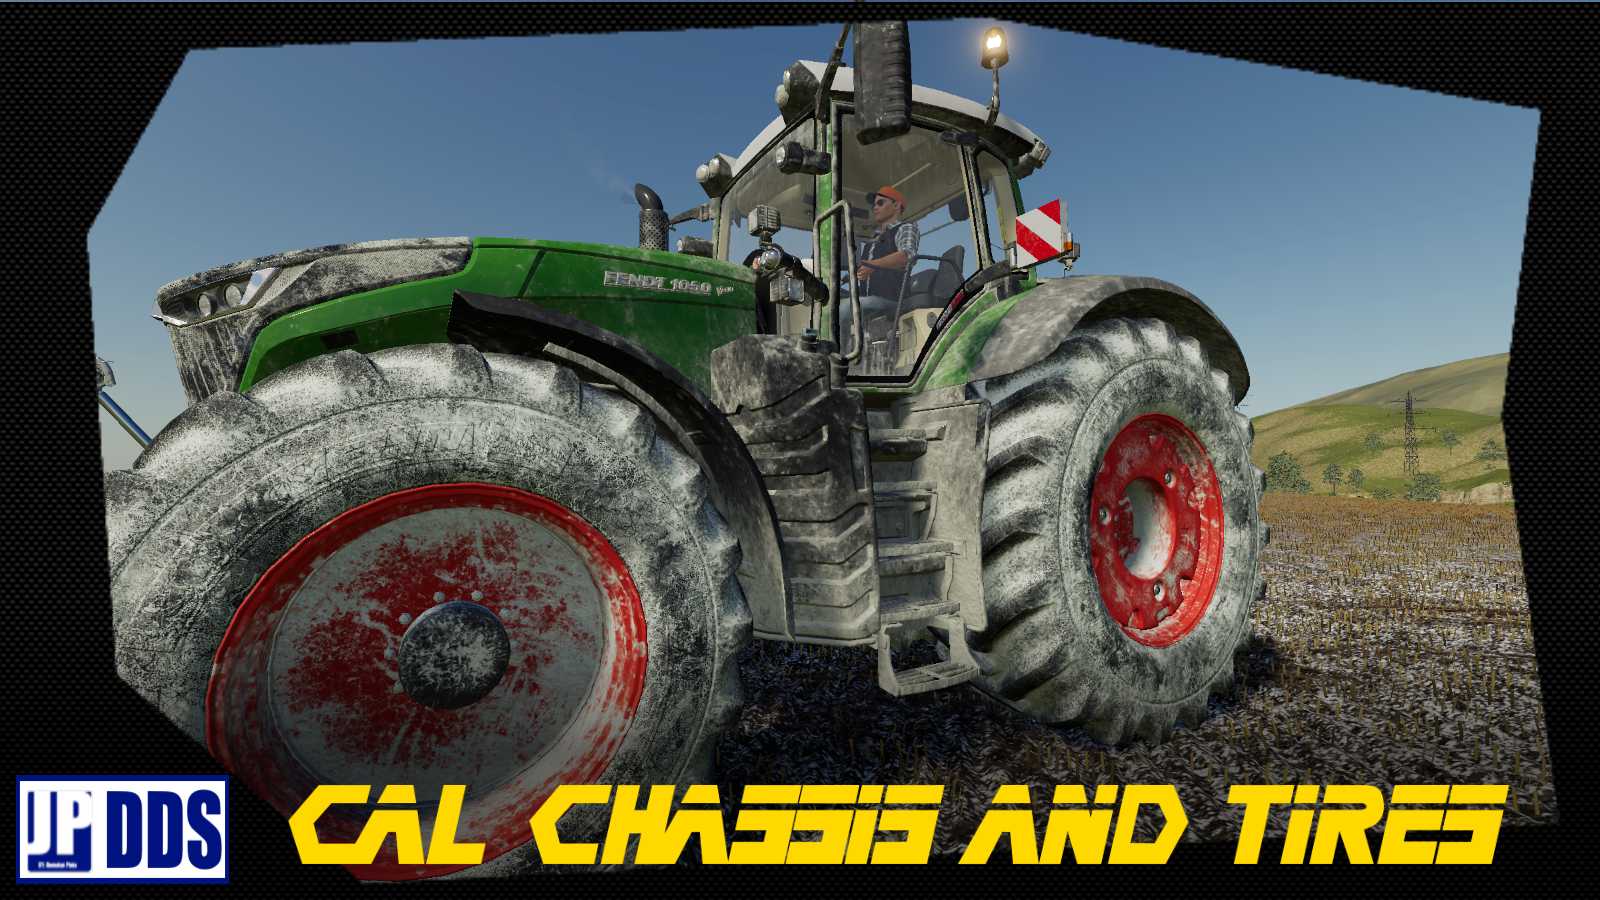 Addon to Mod Real Dirt Color V1 0 0 5 FS19 - Farming Simulator 19